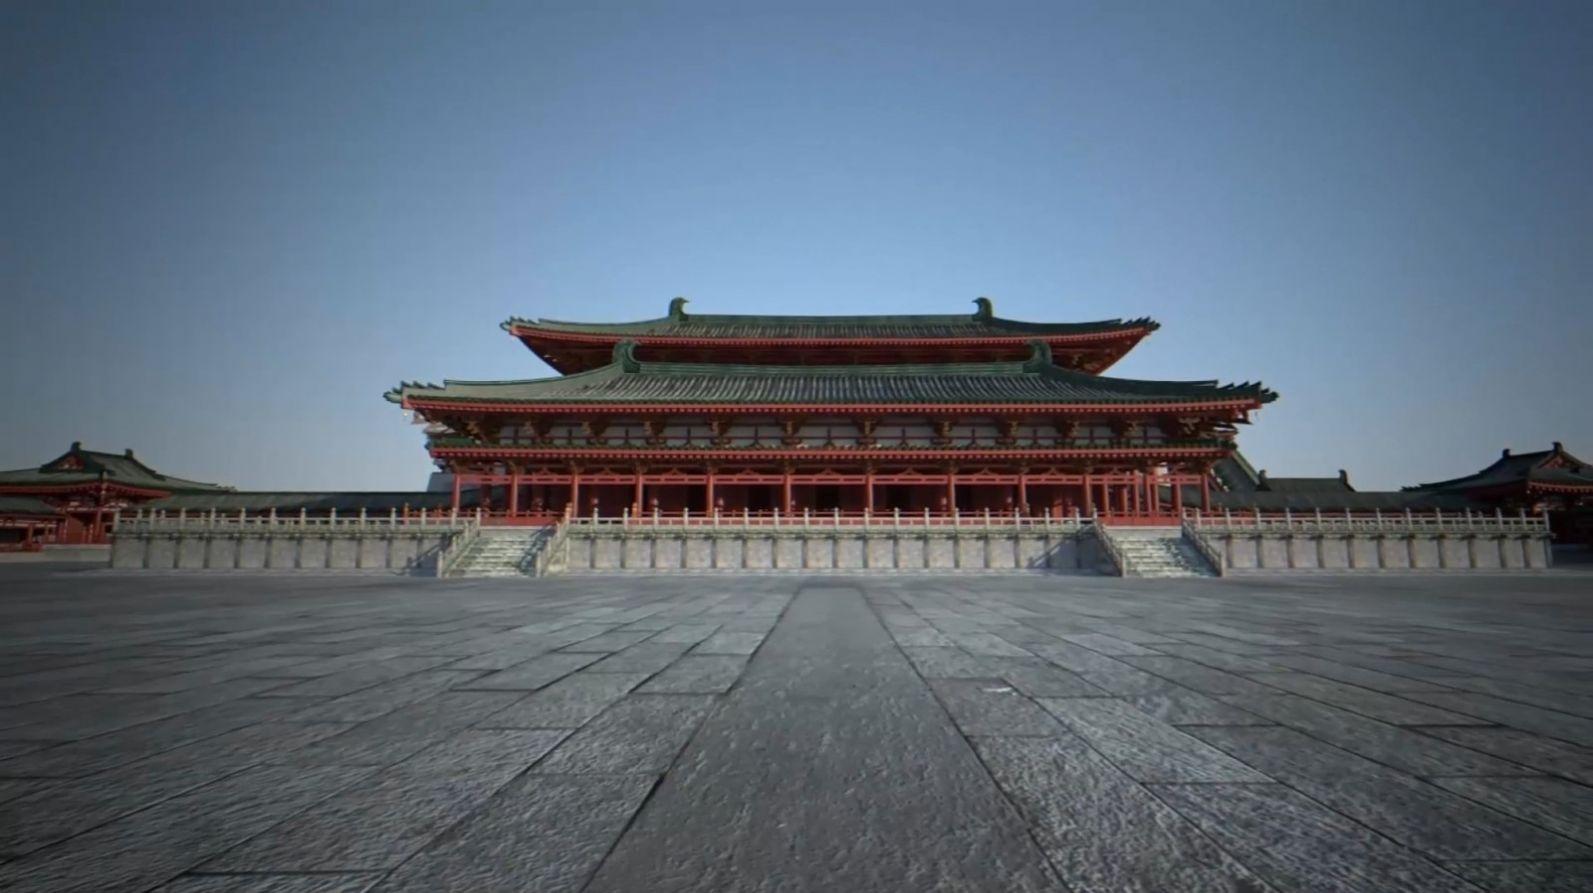 中国建筑师Chinese Architect截图